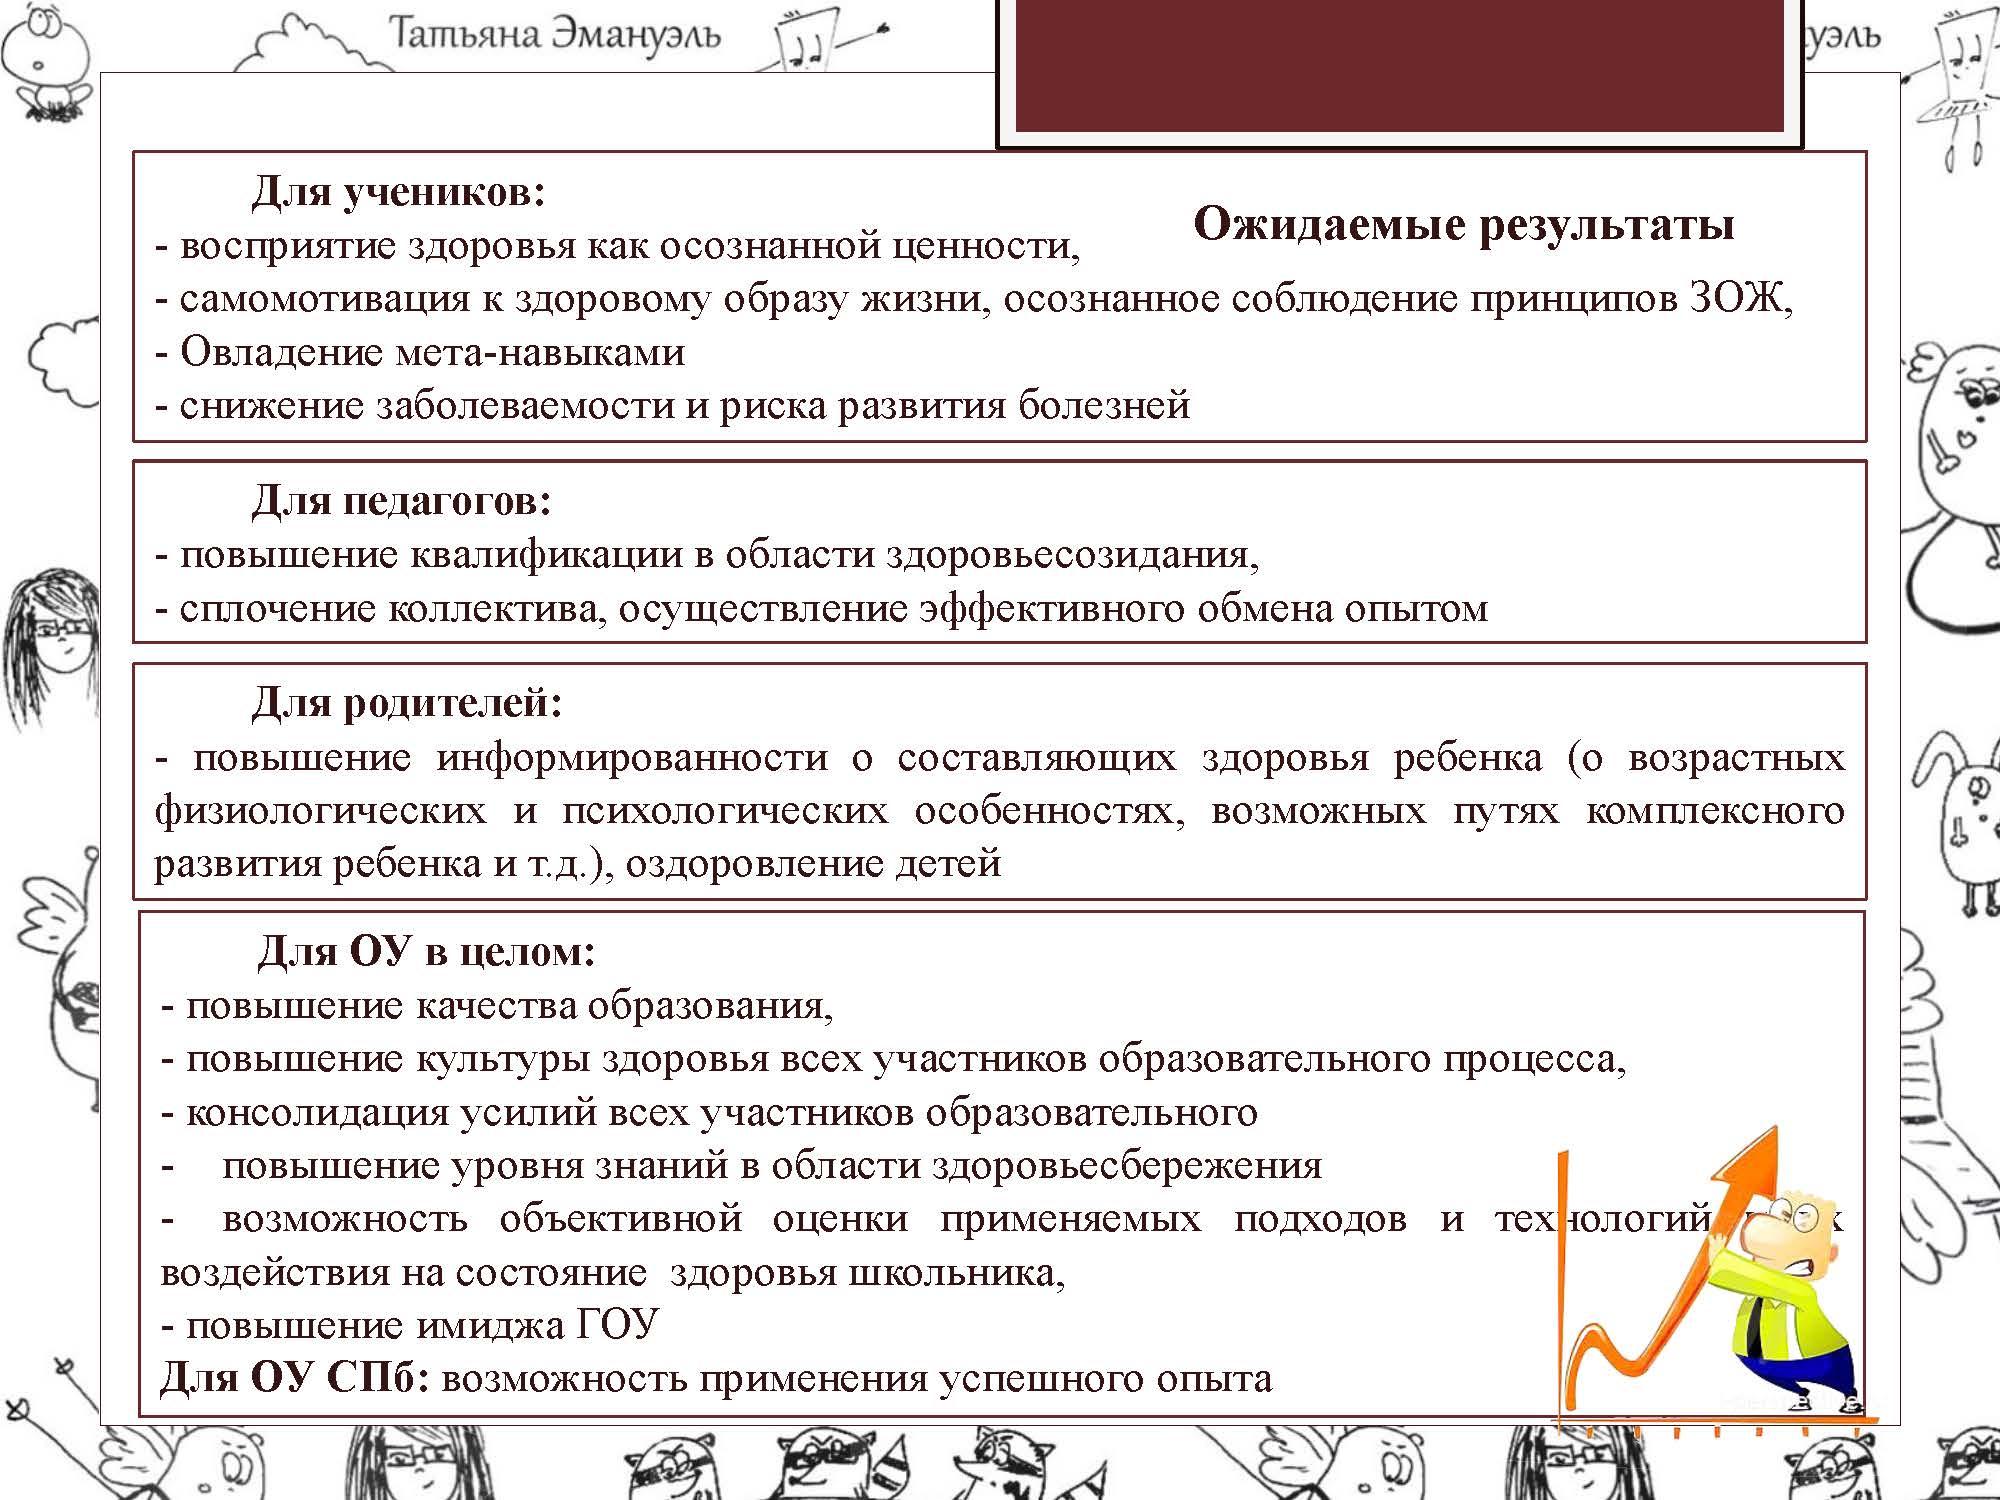 06 февраля эмануэль_Страница_053